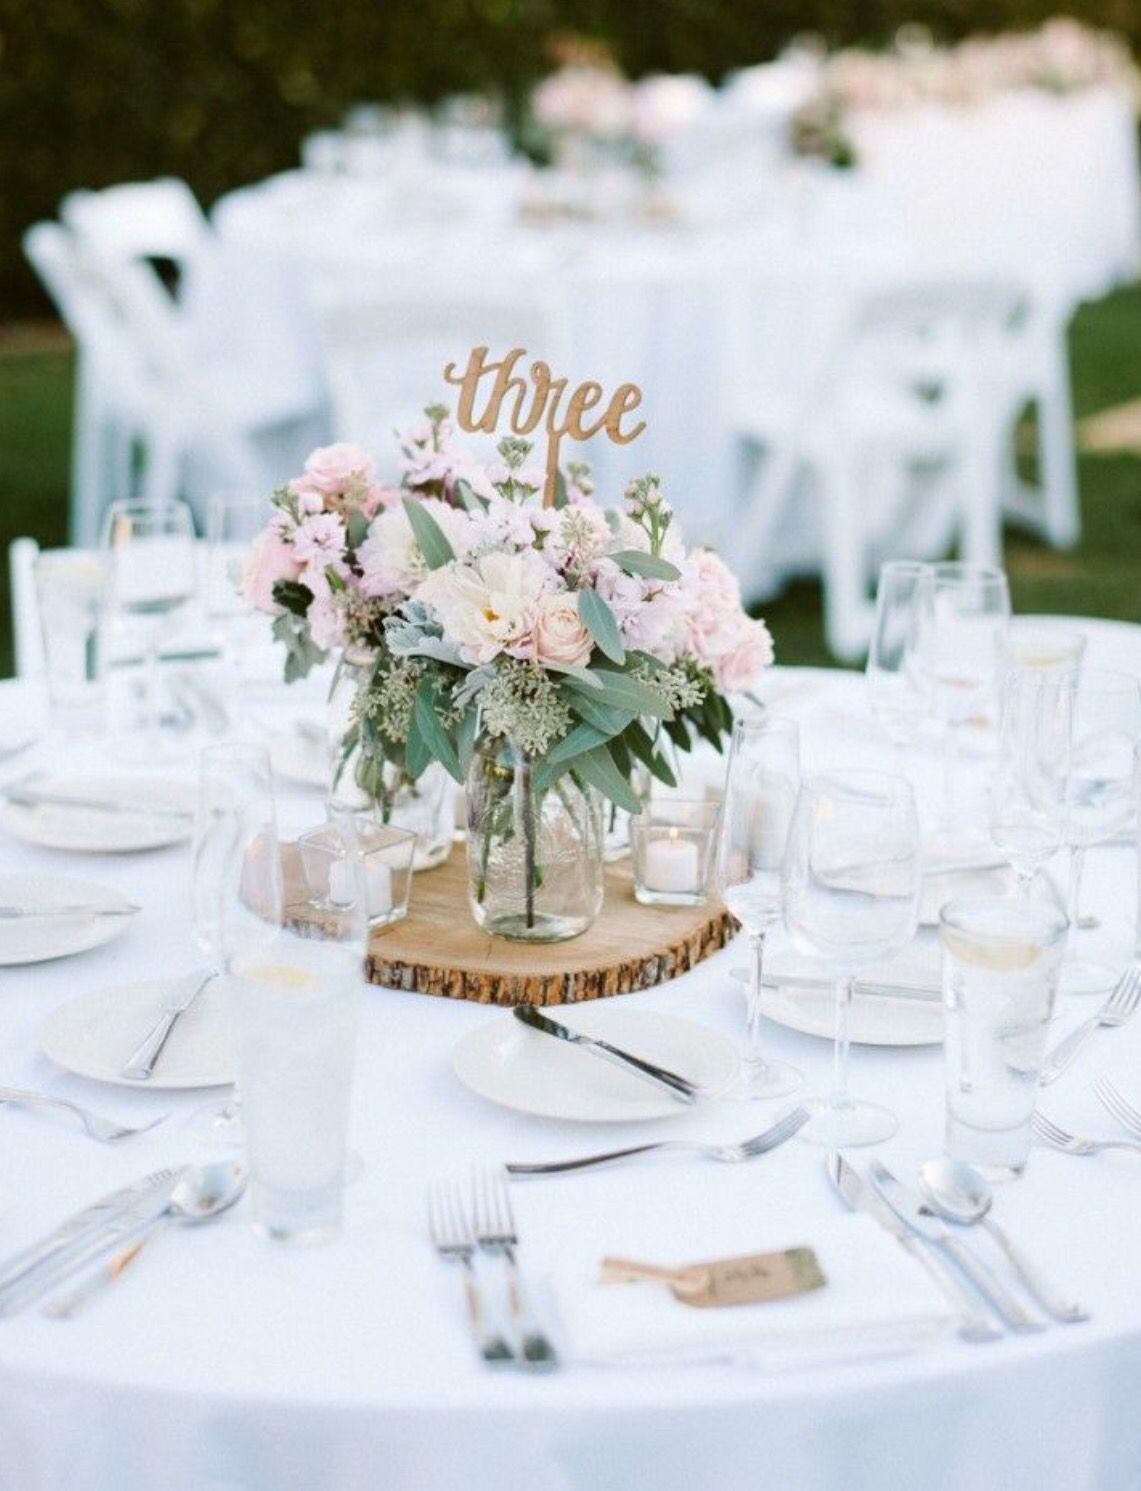 Diy flower decorations wedding  Centerpiece inspiration  Diy brides  Pinterest  Centerpieces